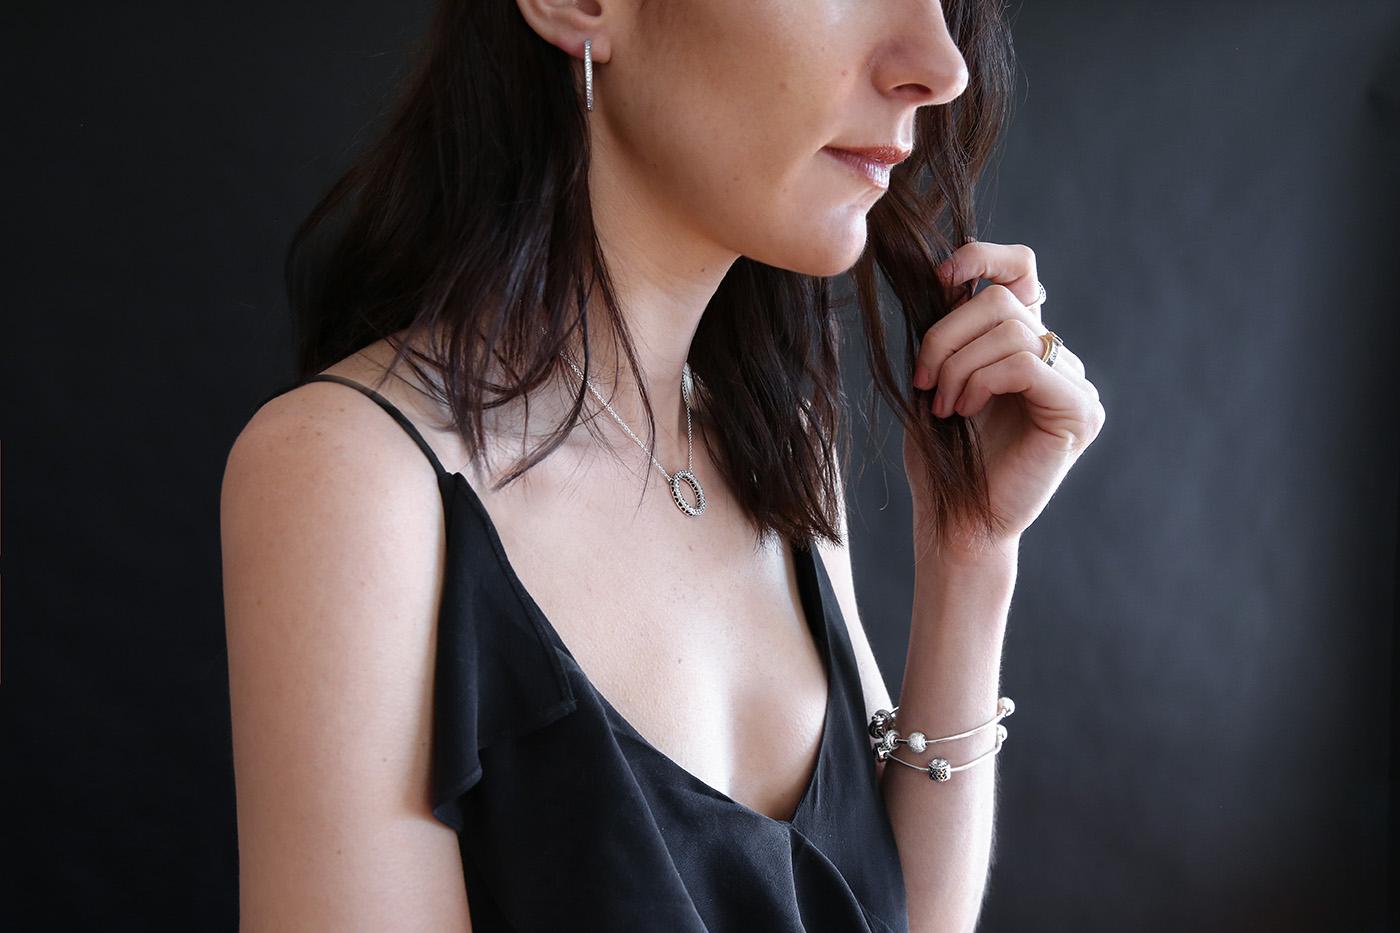 pandora jewellery doseethewonderful mademoiselle